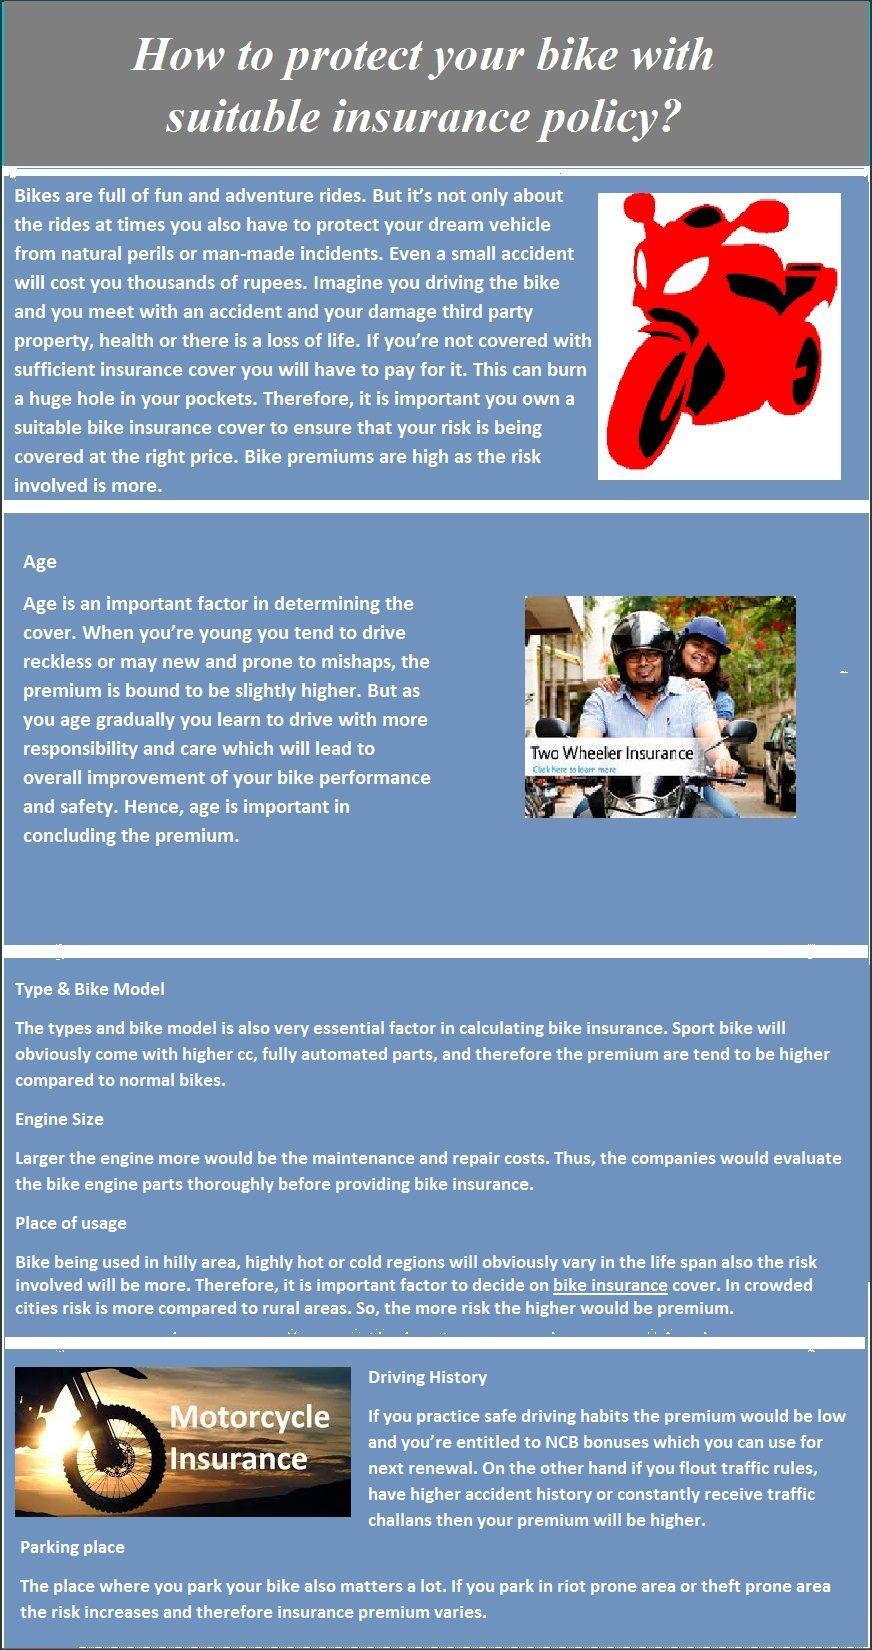 Buy Two-Wheeler Insurance in 4 easy steps. It provides ...